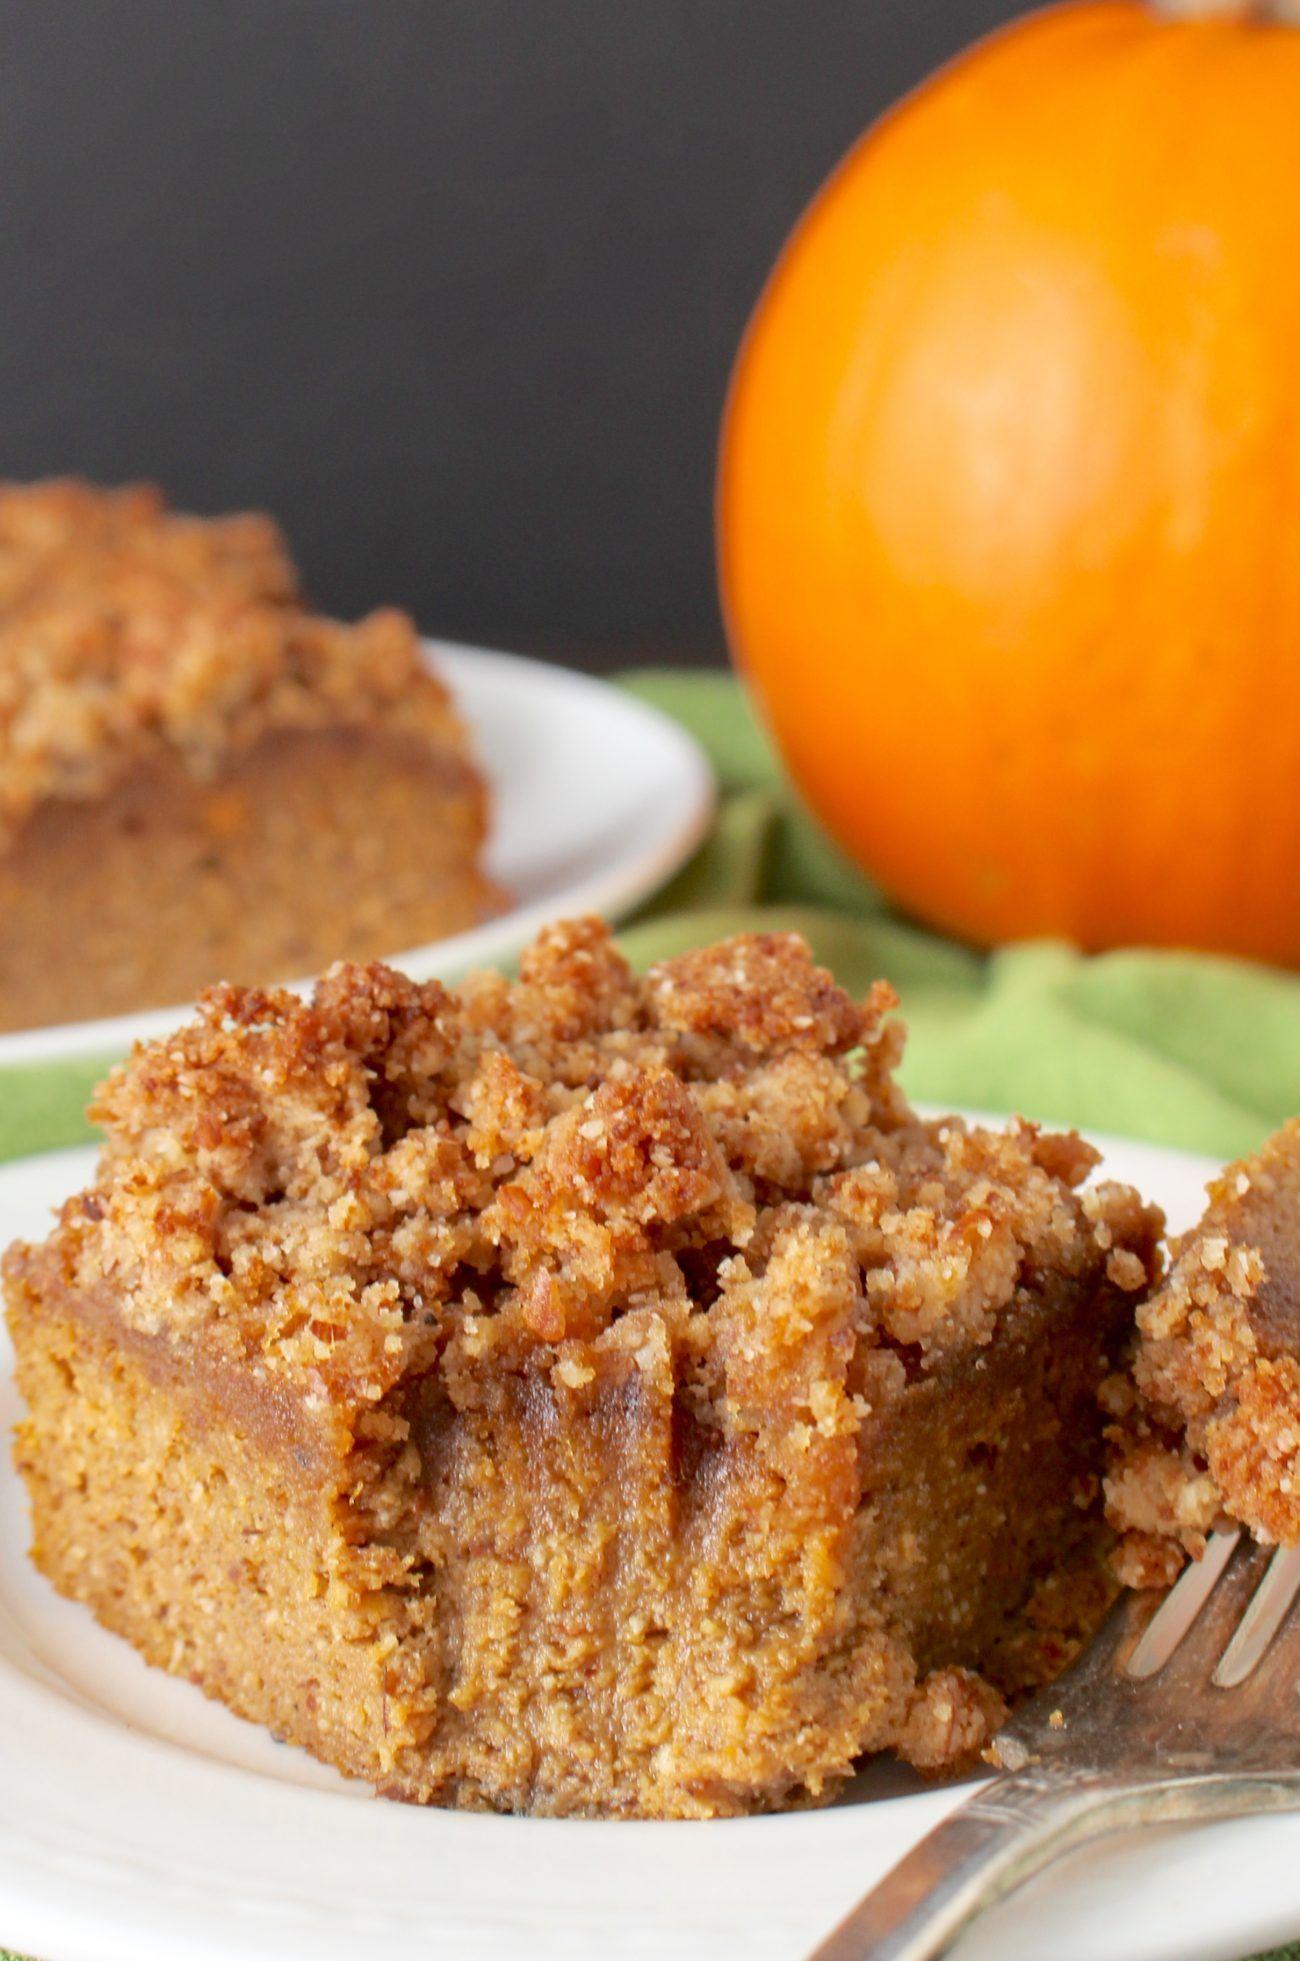 Paleo Pumpkin Coffee Cake Recipe Paleo pumpkin recipes